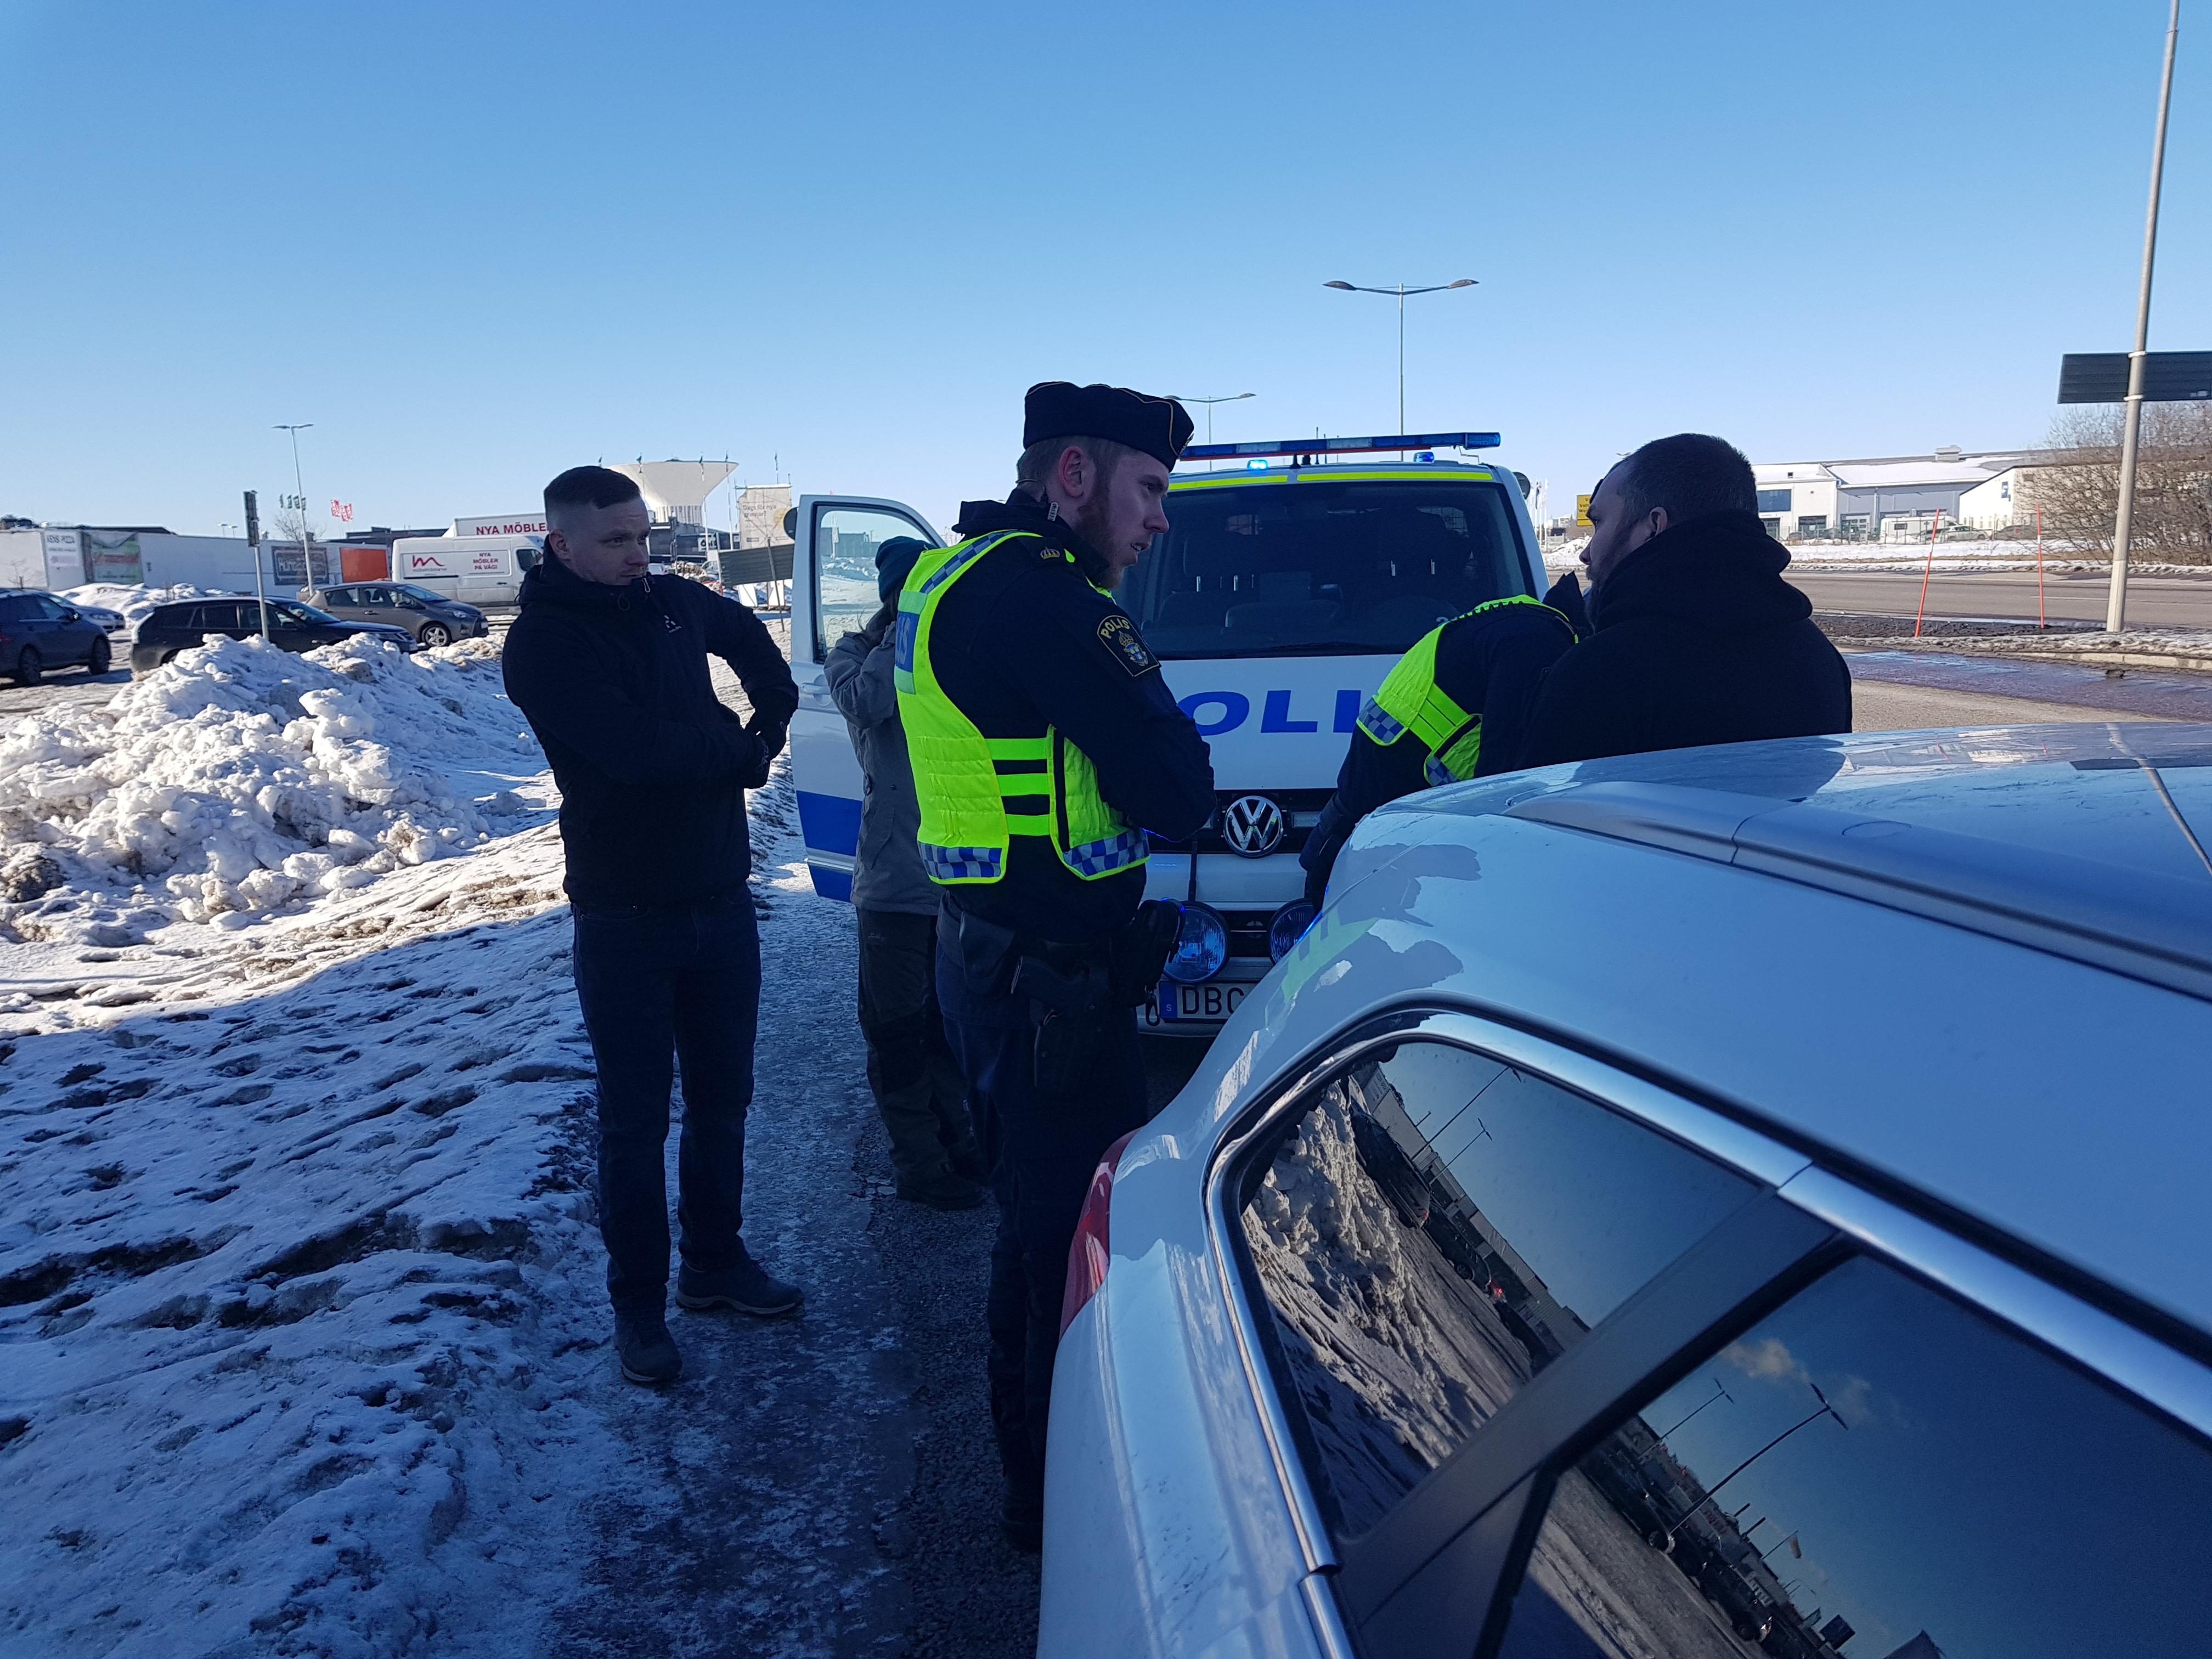 Polisens nya order skydda stan